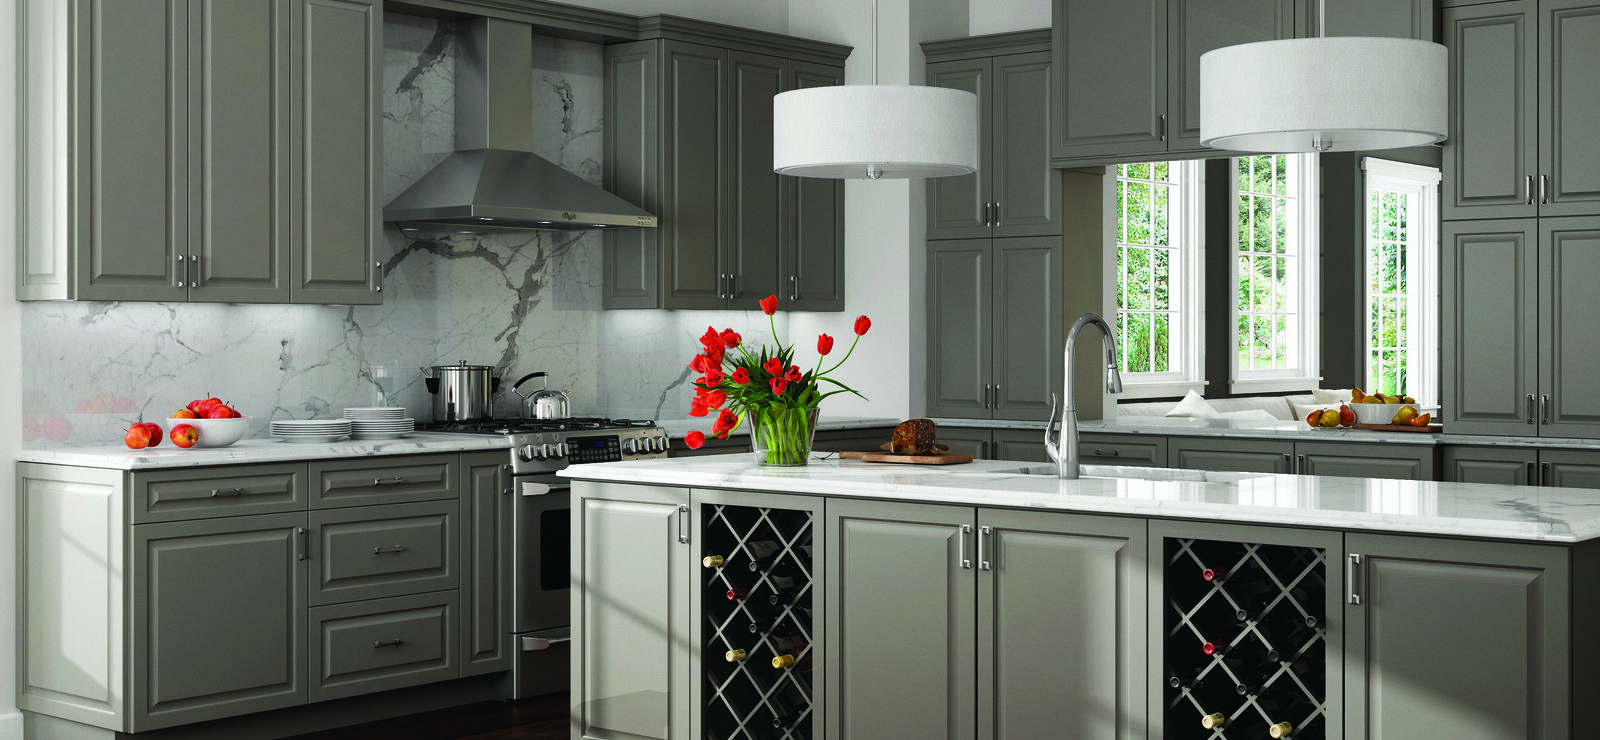 Merveilleux Asheville Kitchen And Bath Design